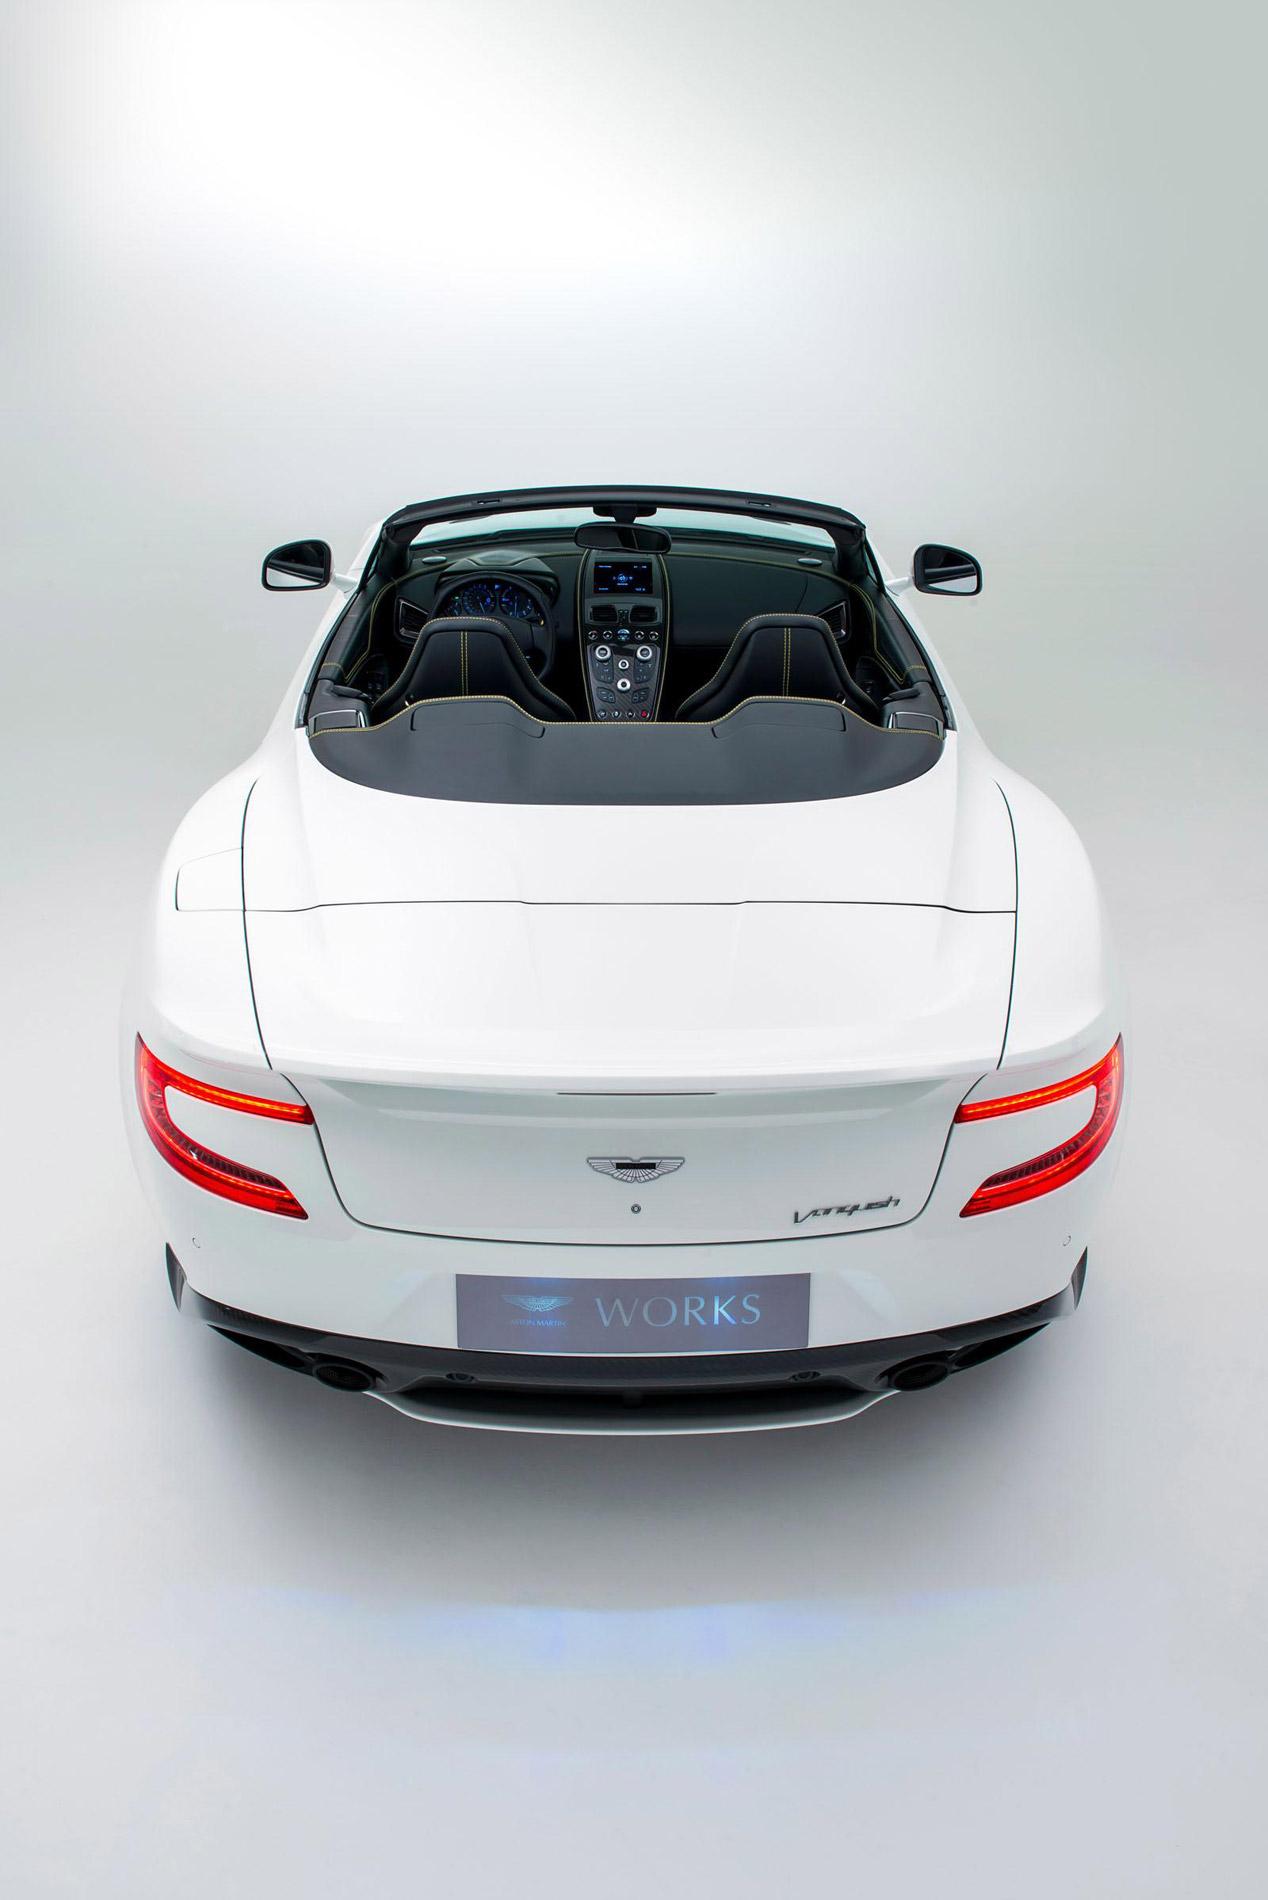 Aston Martin Works 60 Aniversario